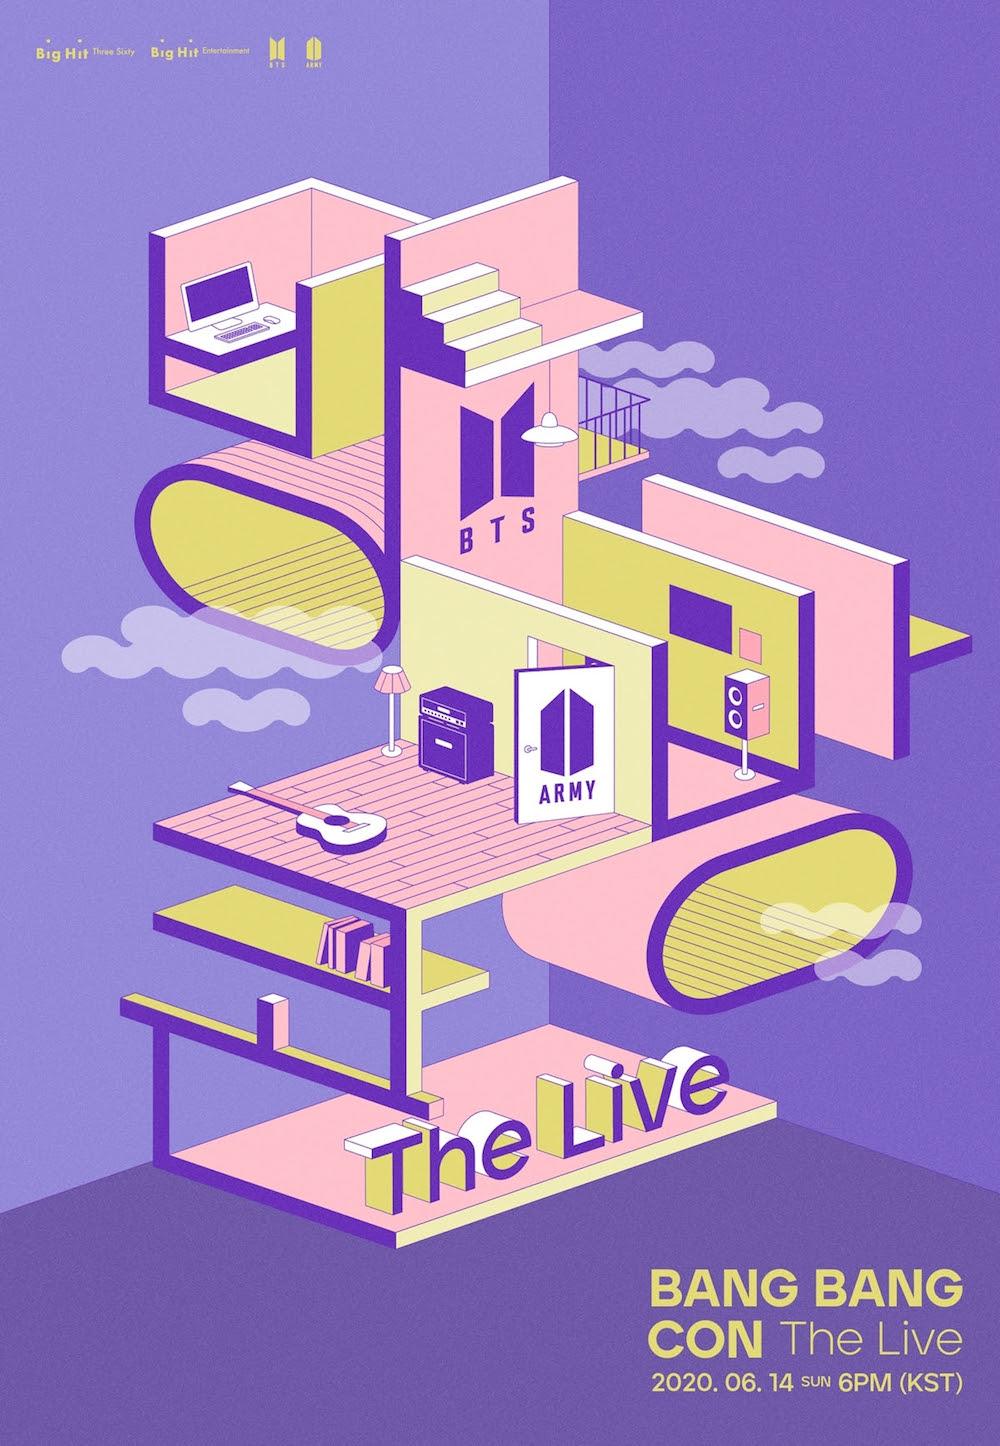 bts bang bang con the live concert livestream details BTS Announce Concert Livestream BANG BANG CON The Live